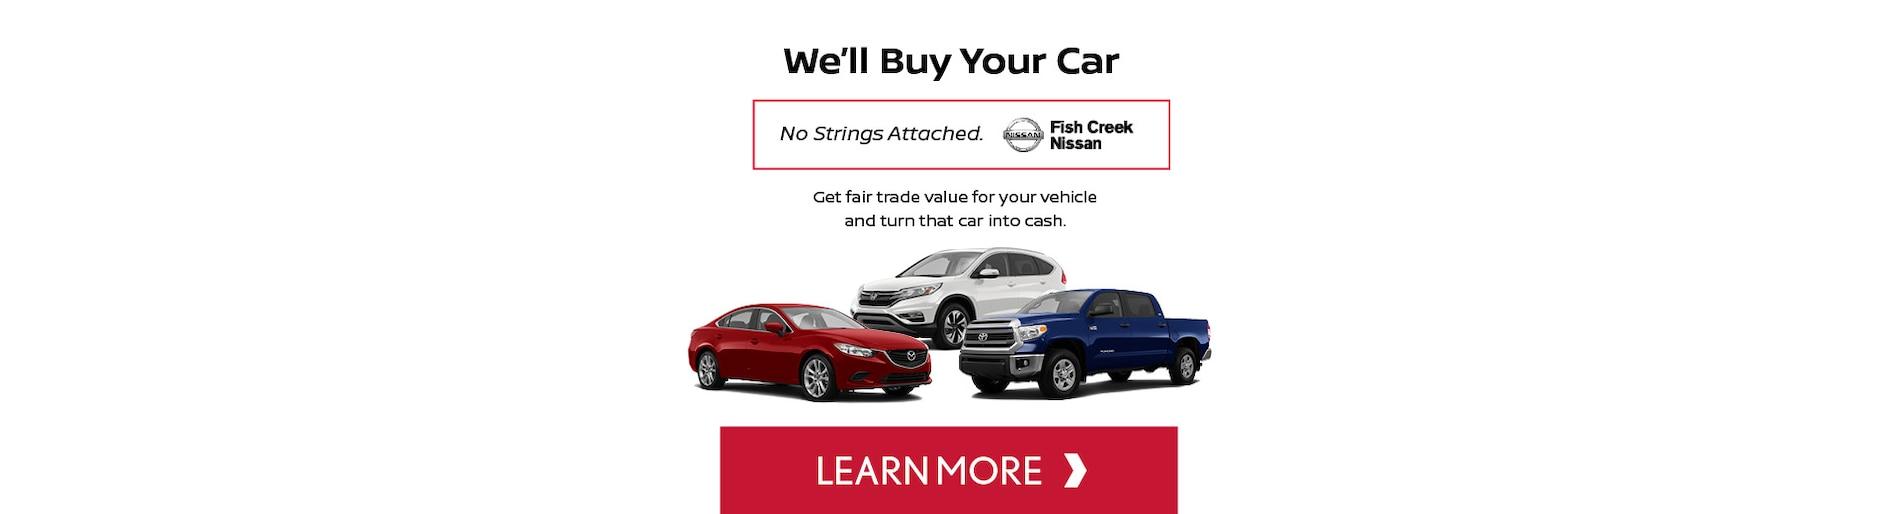 Fine We Buy Cars Calgary Image - Classic Cars Ideas - boiq.info